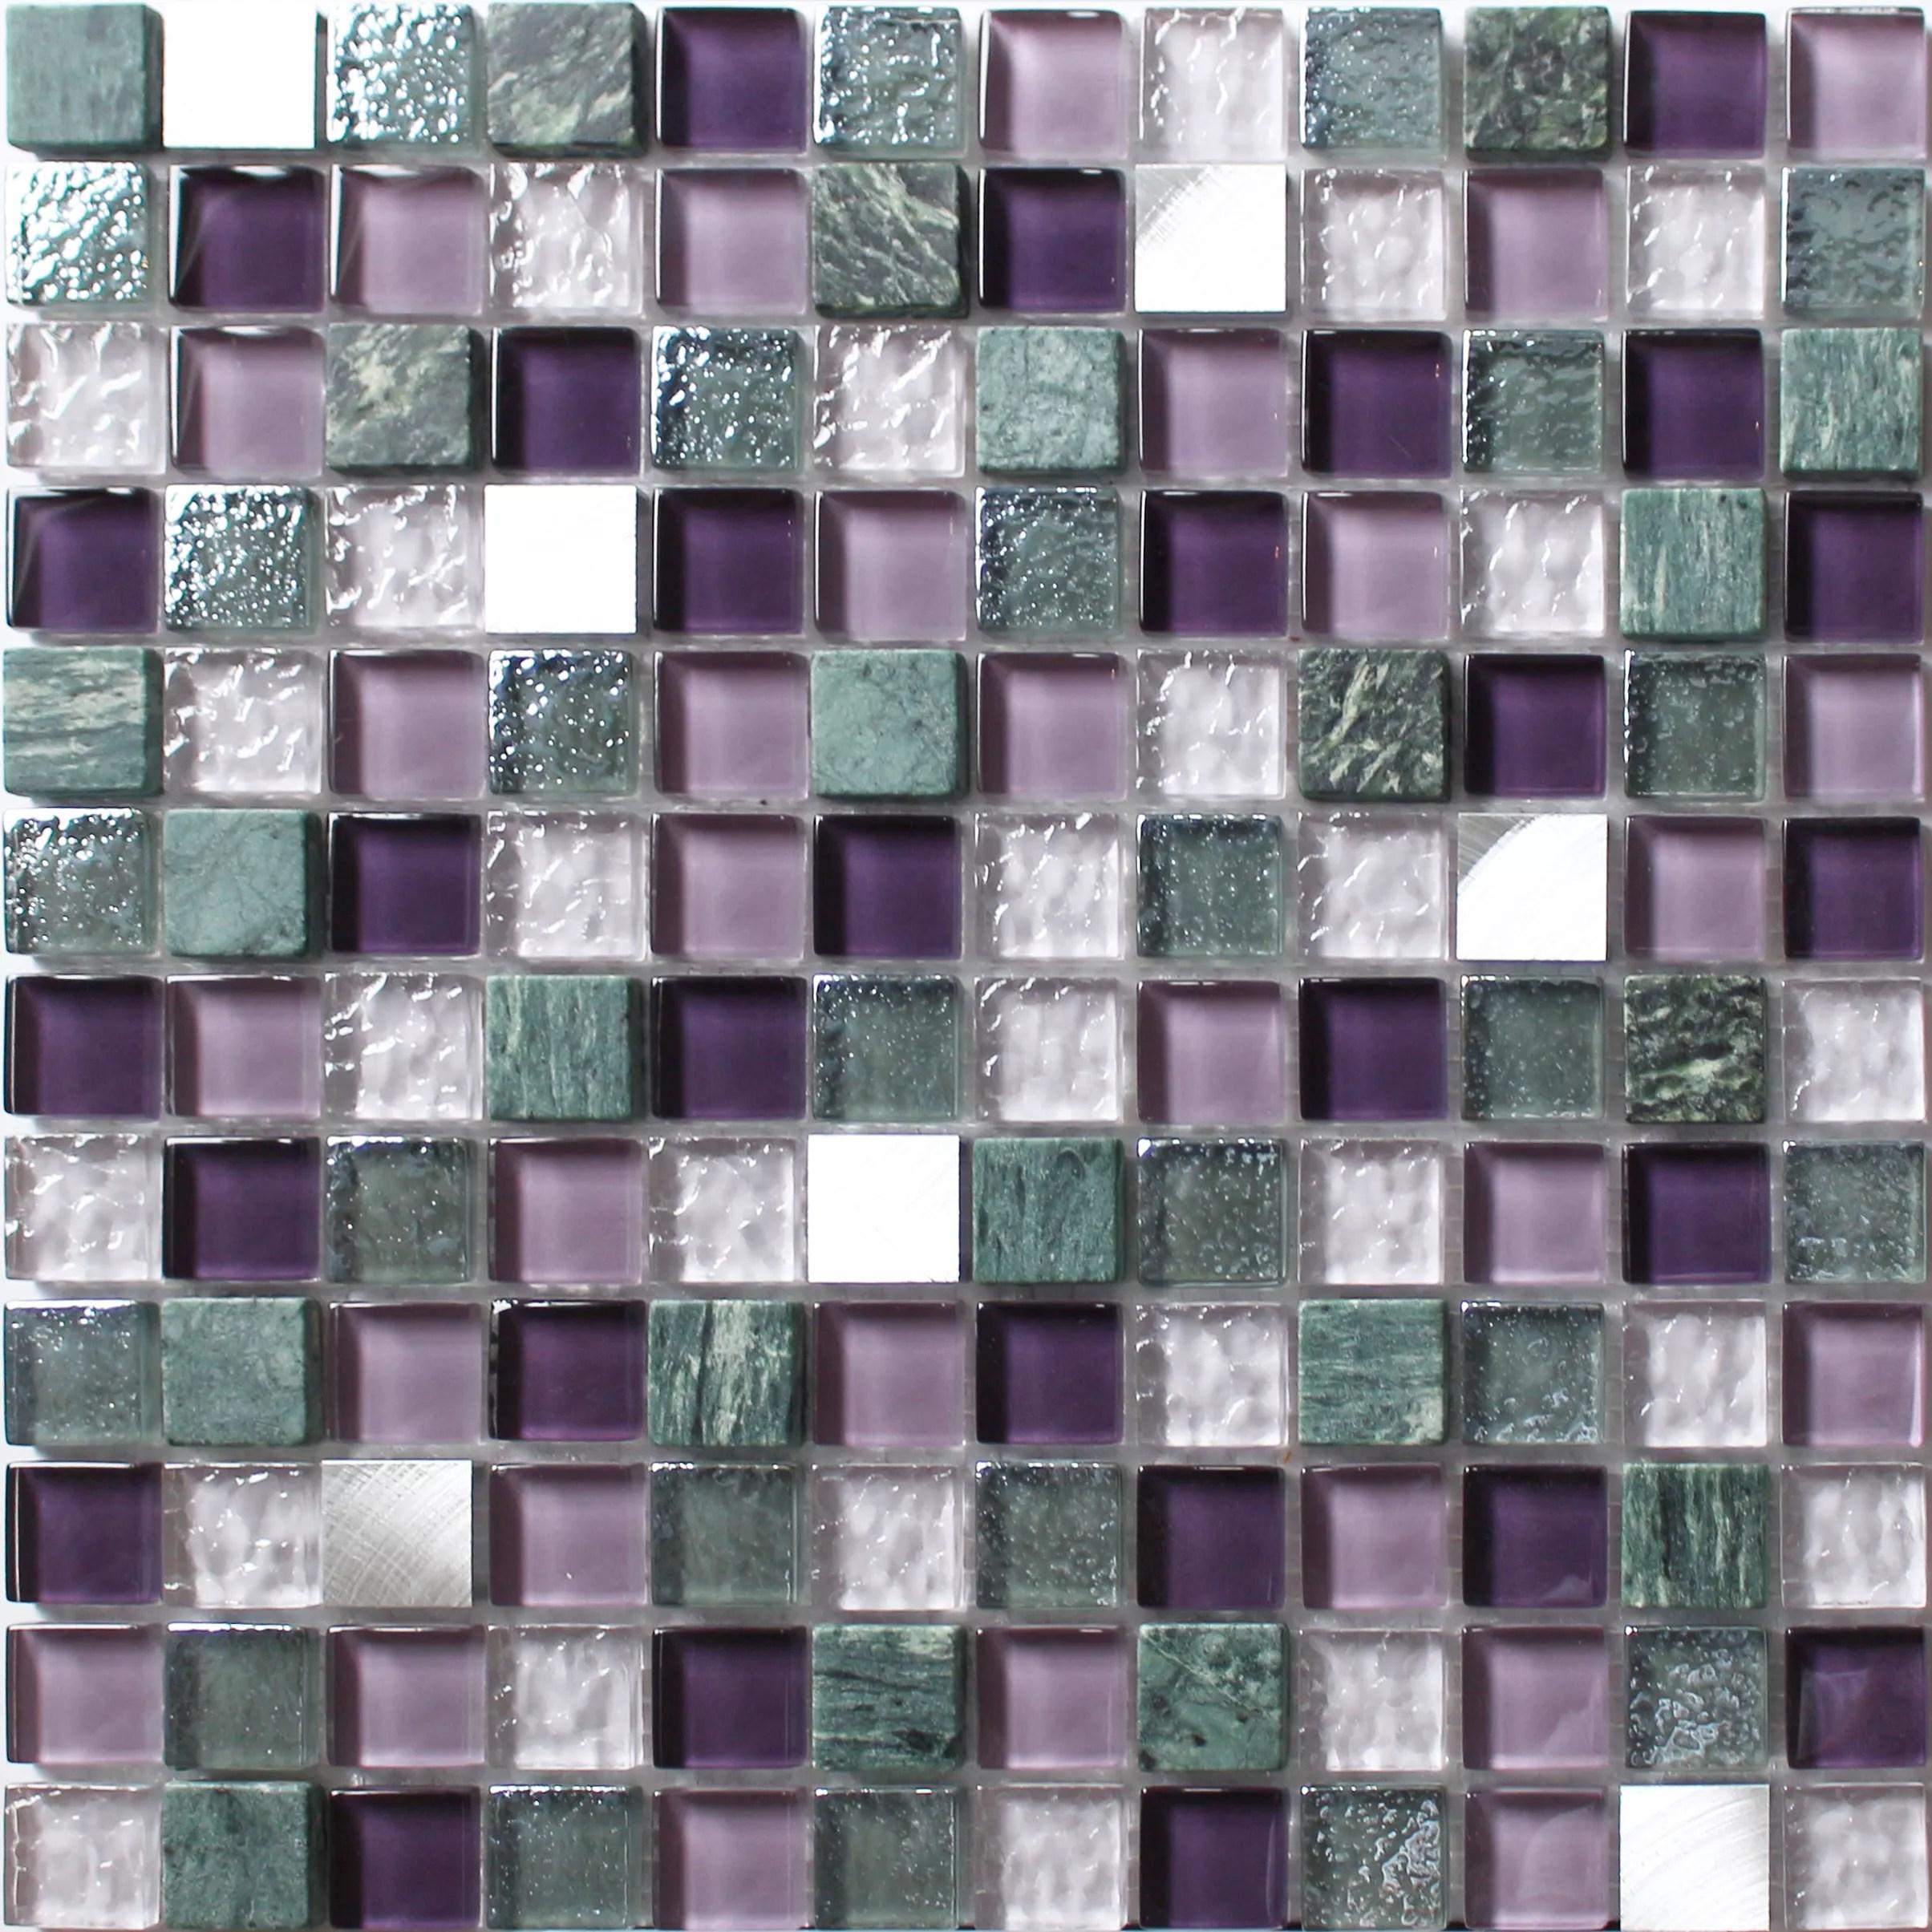 camden purple stone effect glass marble mosaic tile l 300mm w 300mm